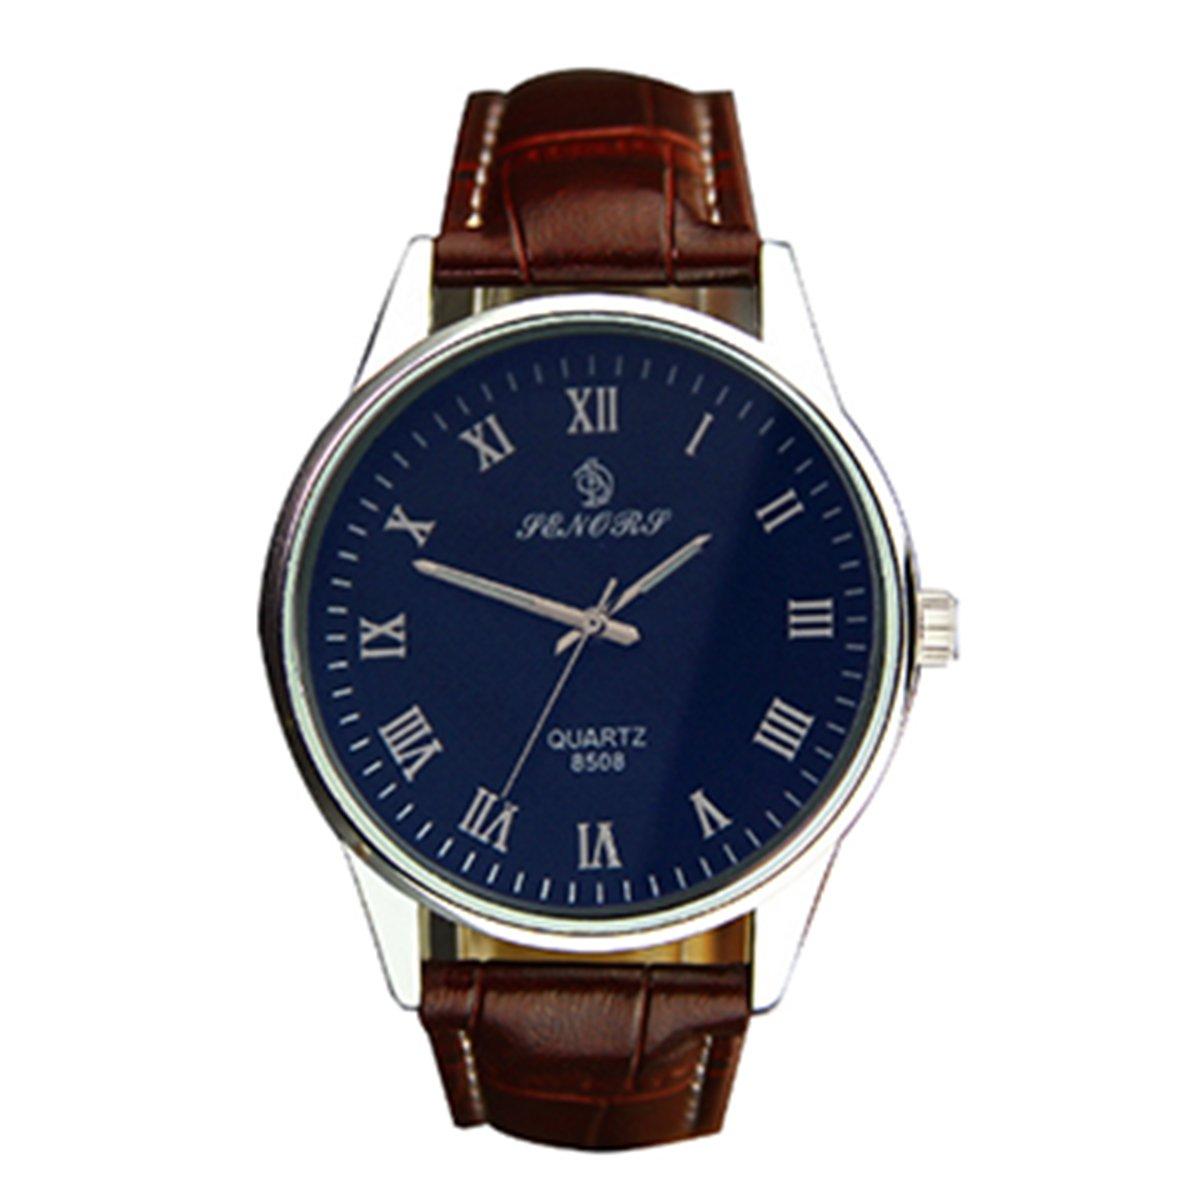 SENORS Classic Men's Wrist Quartz Watch Dress Fashion Roman Watch Business Simple Clock Men Wrist Watch Waterproof PU Brown Leather Watch for Men